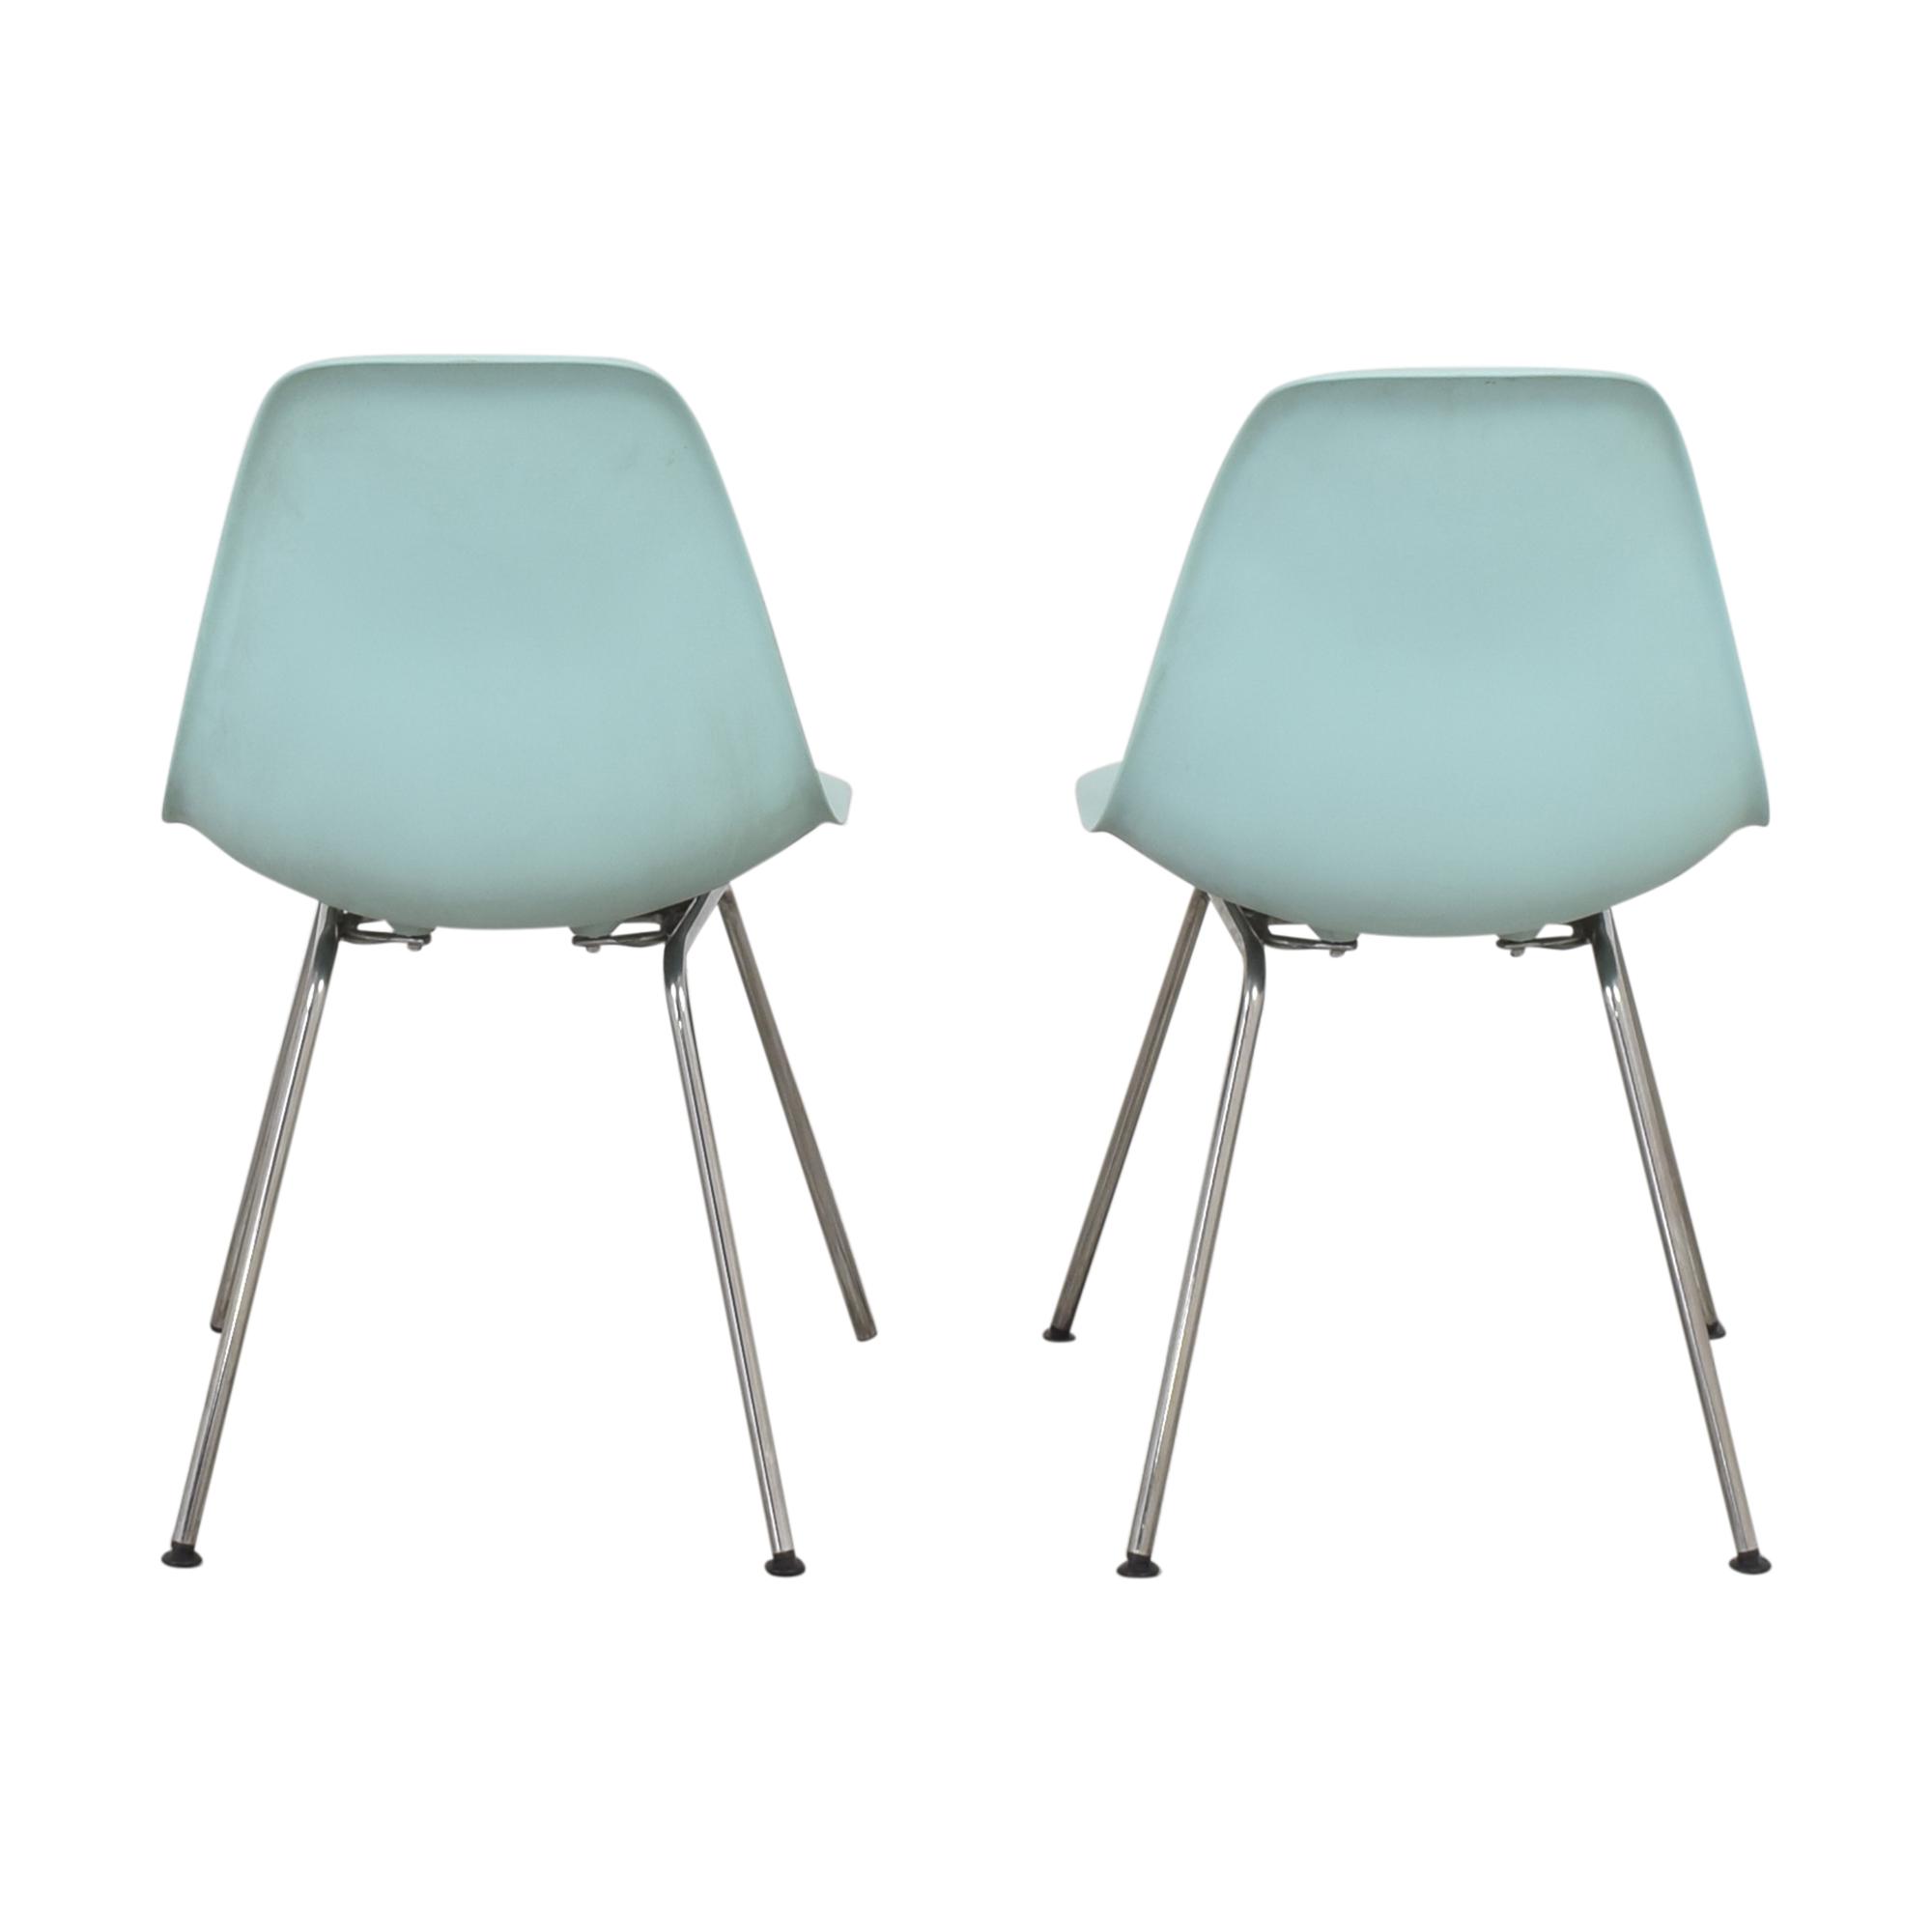 Herman Miller Herman Miller Eames Molded Side Chair, 4-Leg Base second hand